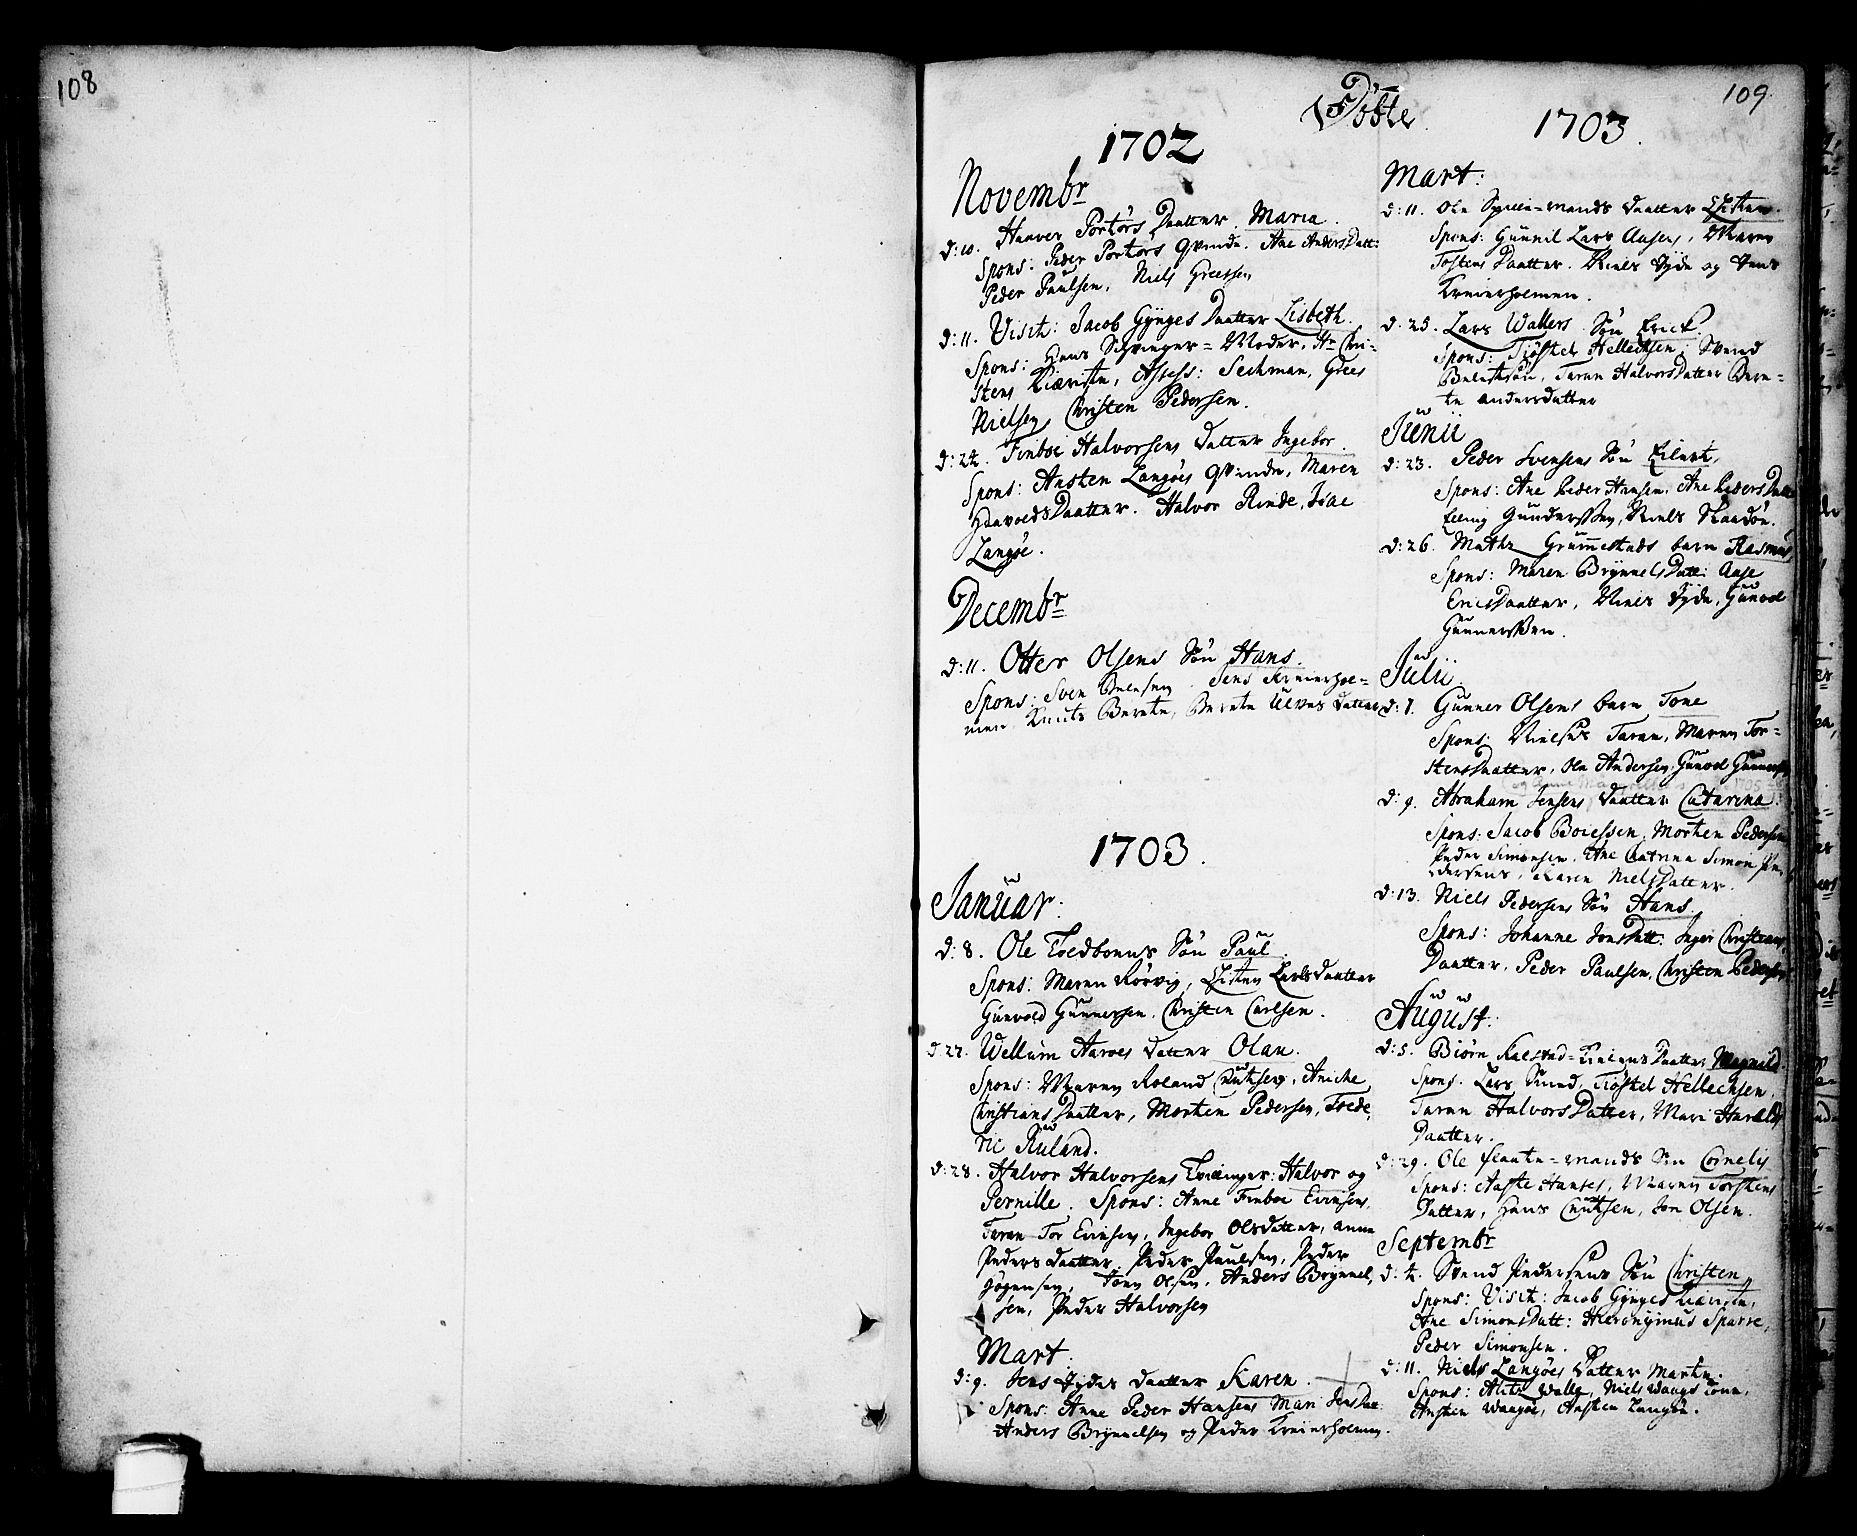 SAKO, Kragerø kirkebøker, F/Fa/L0001: Ministerialbok nr. 1, 1702-1766, s. 108-109